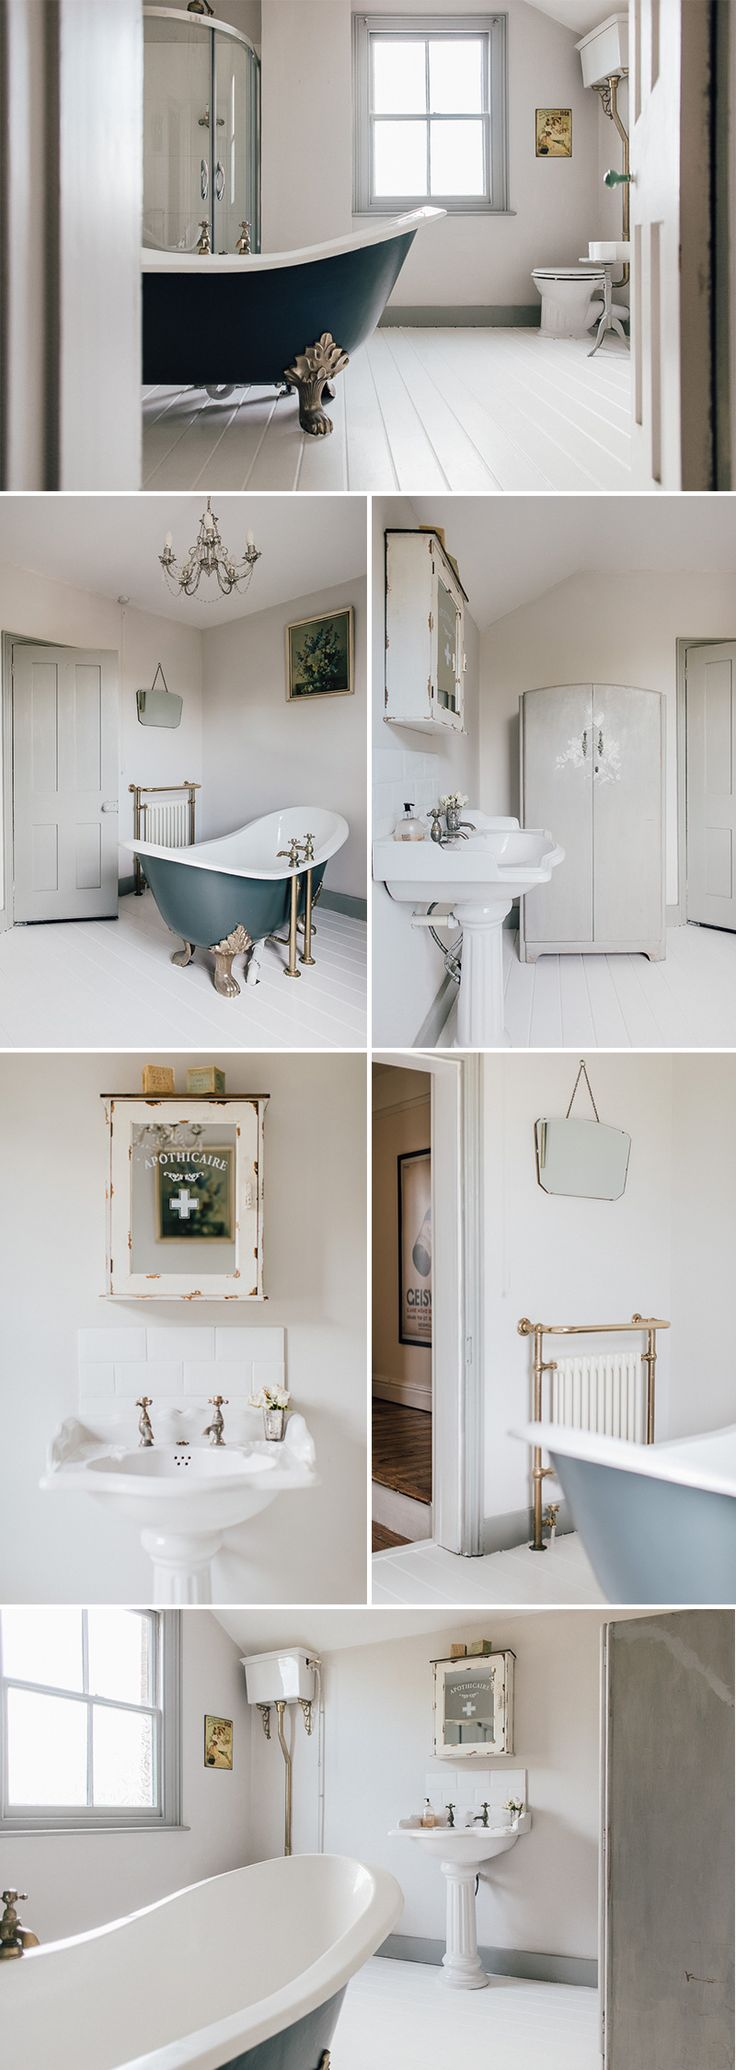 Balterley bathroom furniture - Rebecca S Minimalist Period Home